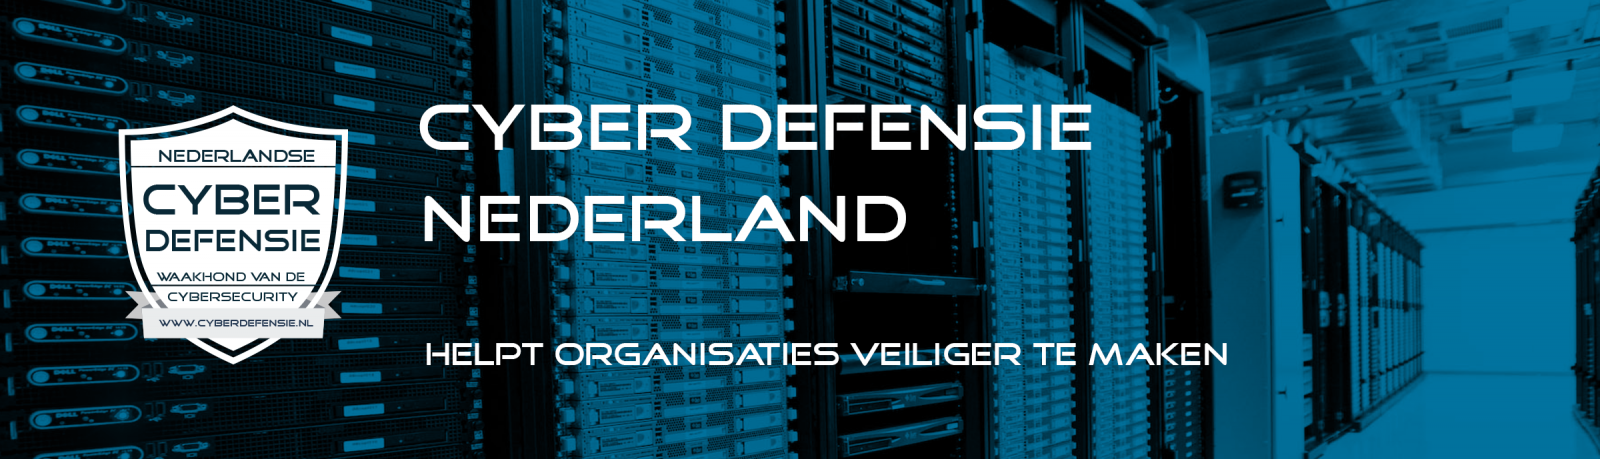 Cyberdefensie, Cybersecurity